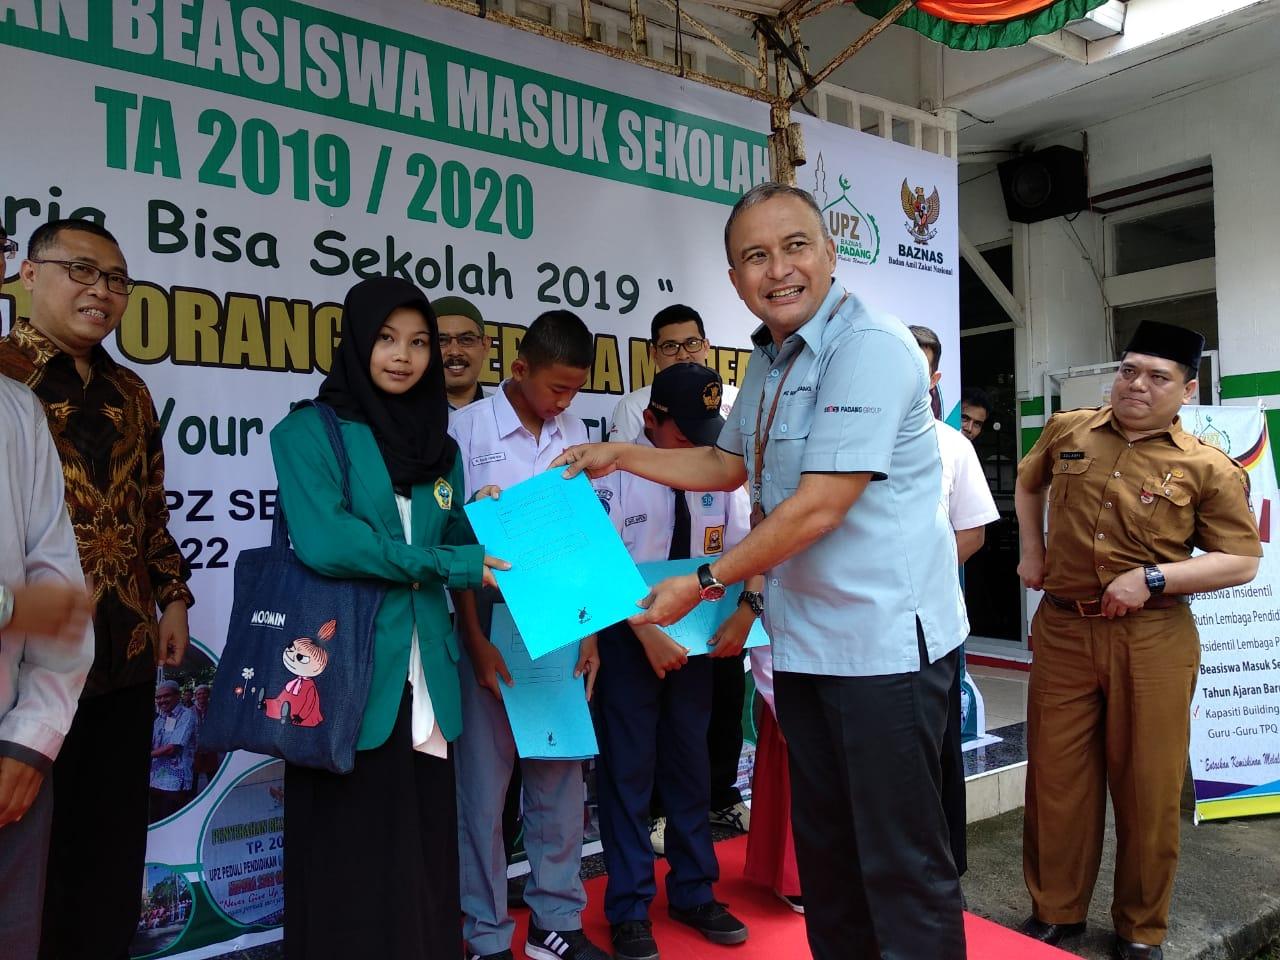 Ketua UPZ Baznas Semen Padang, Oktoweri, menyerahkan bantuan pendidikan secara simbolis kepada salah seorang mahasiswa kurang mampu di Kota Padang